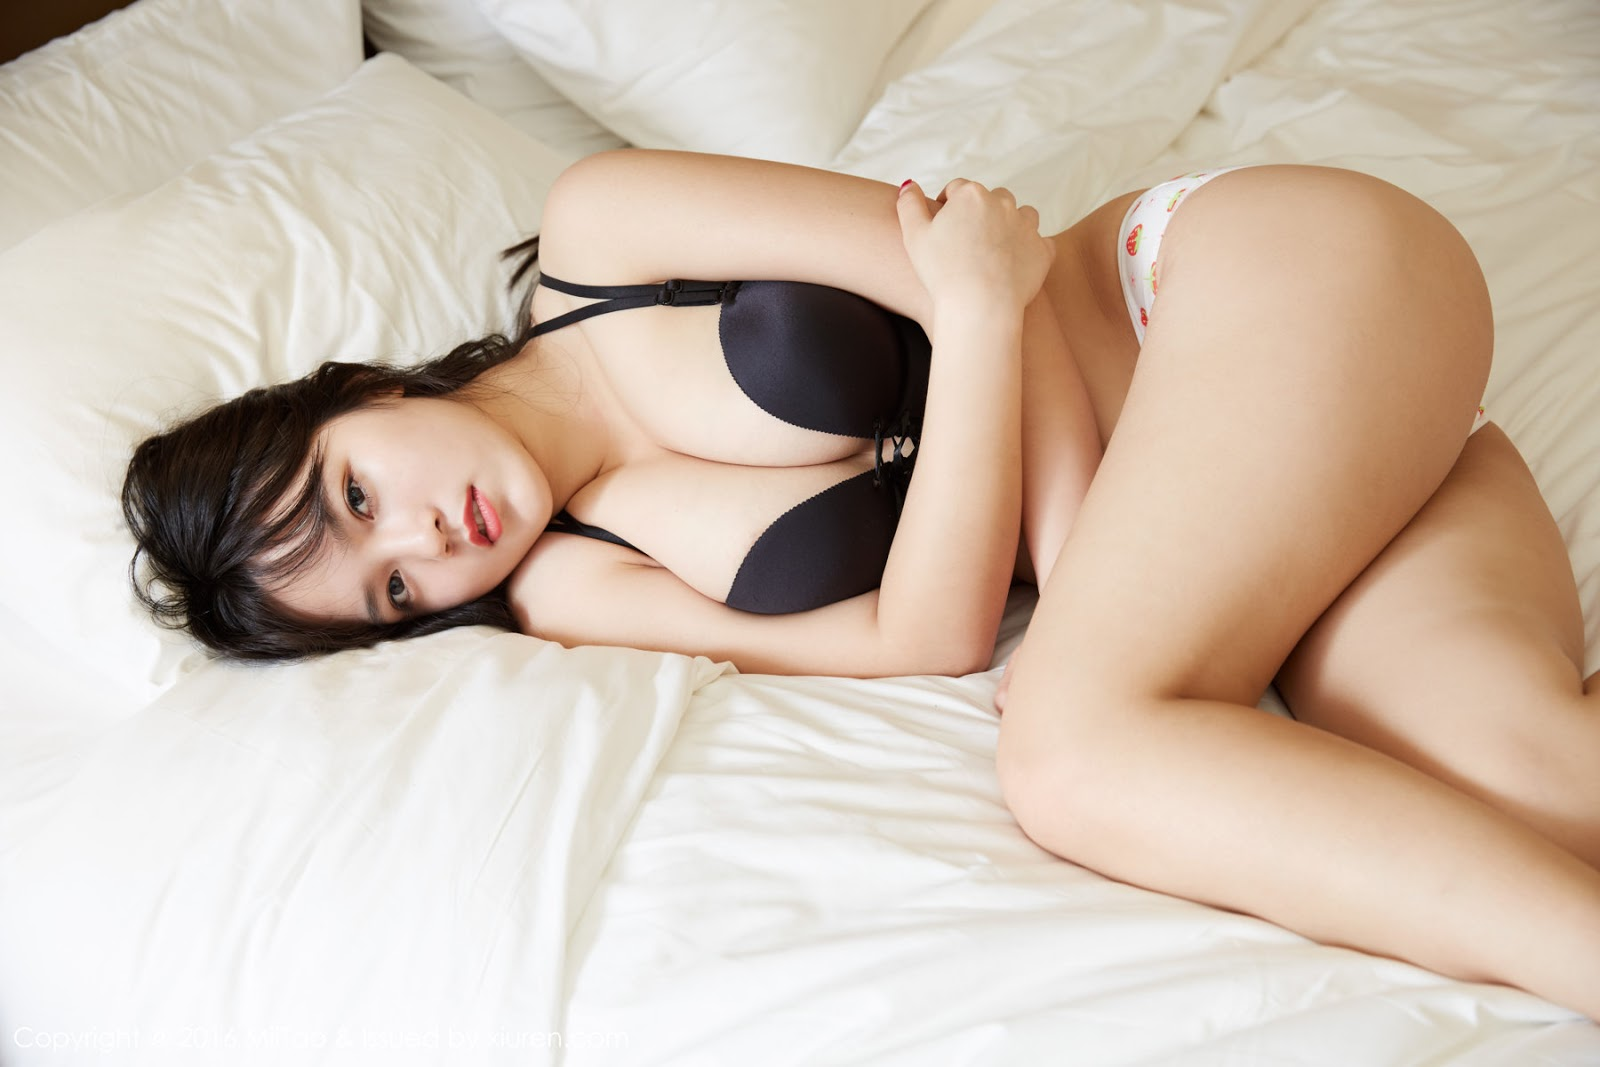 Sexy girl in chinese, girl masturbates while anal